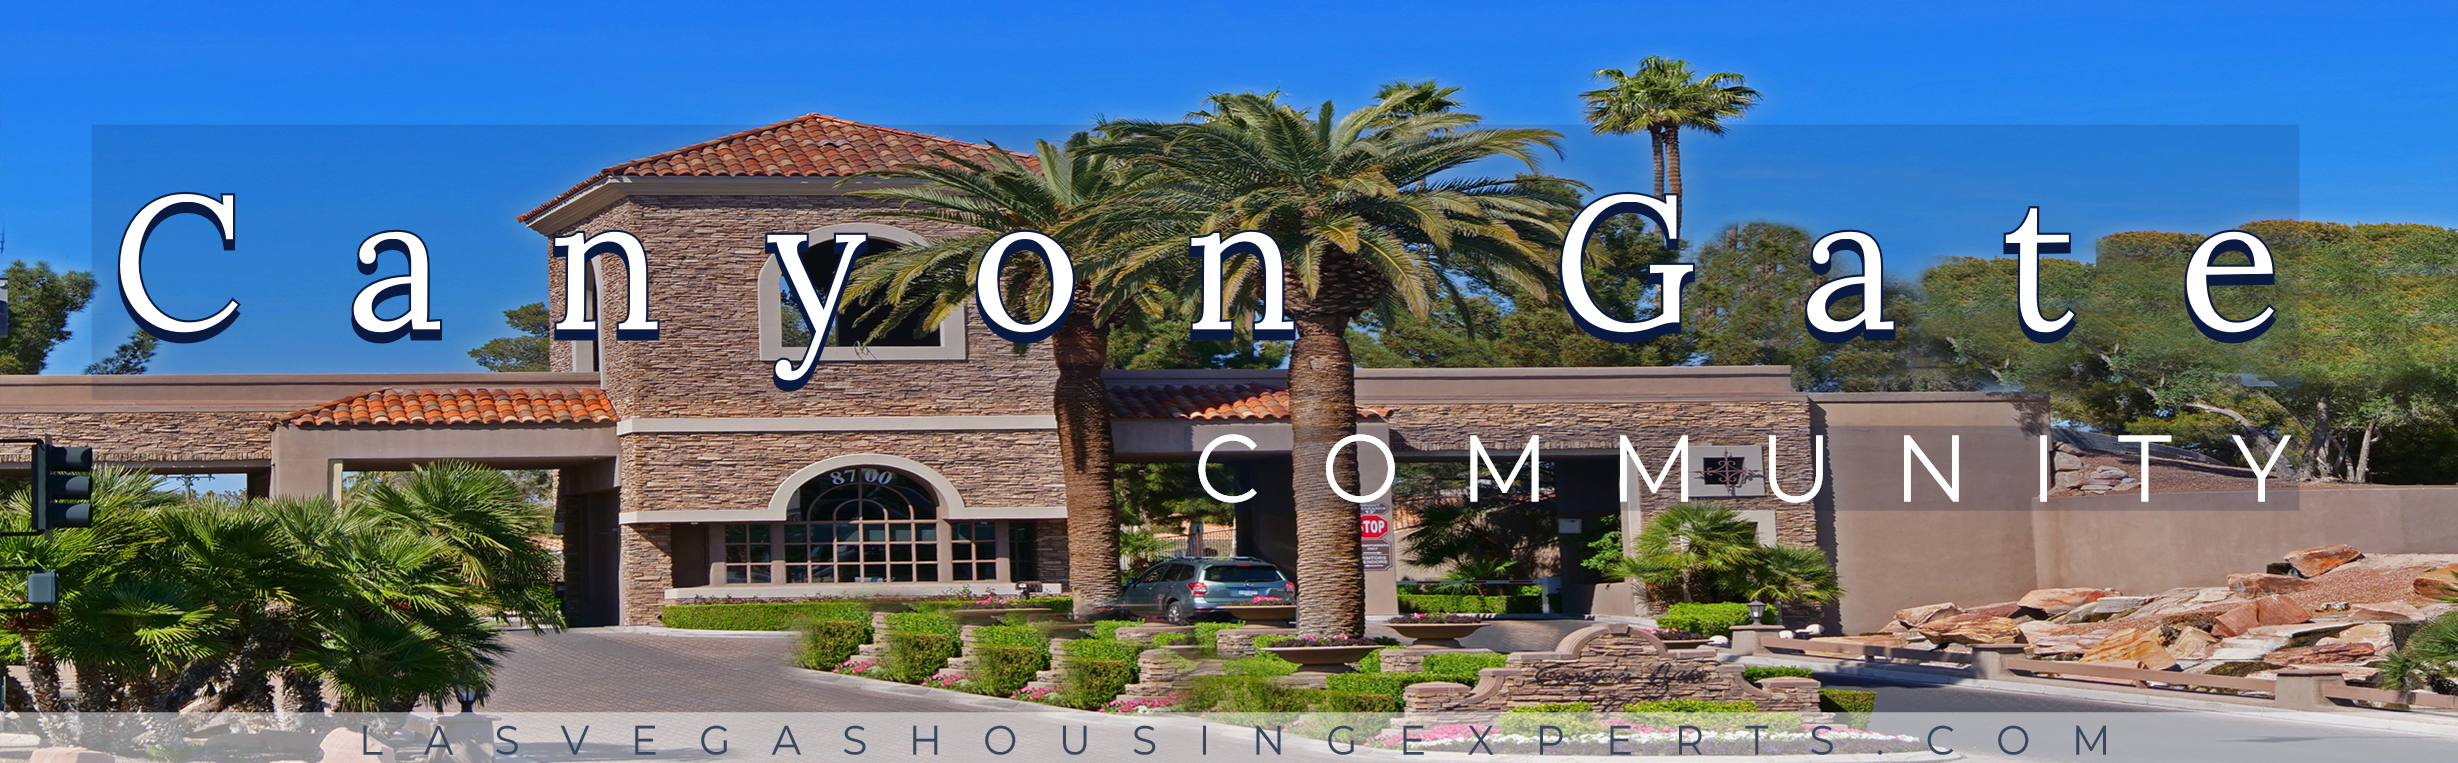 Canyon Gate Las Vegas Housing Experts